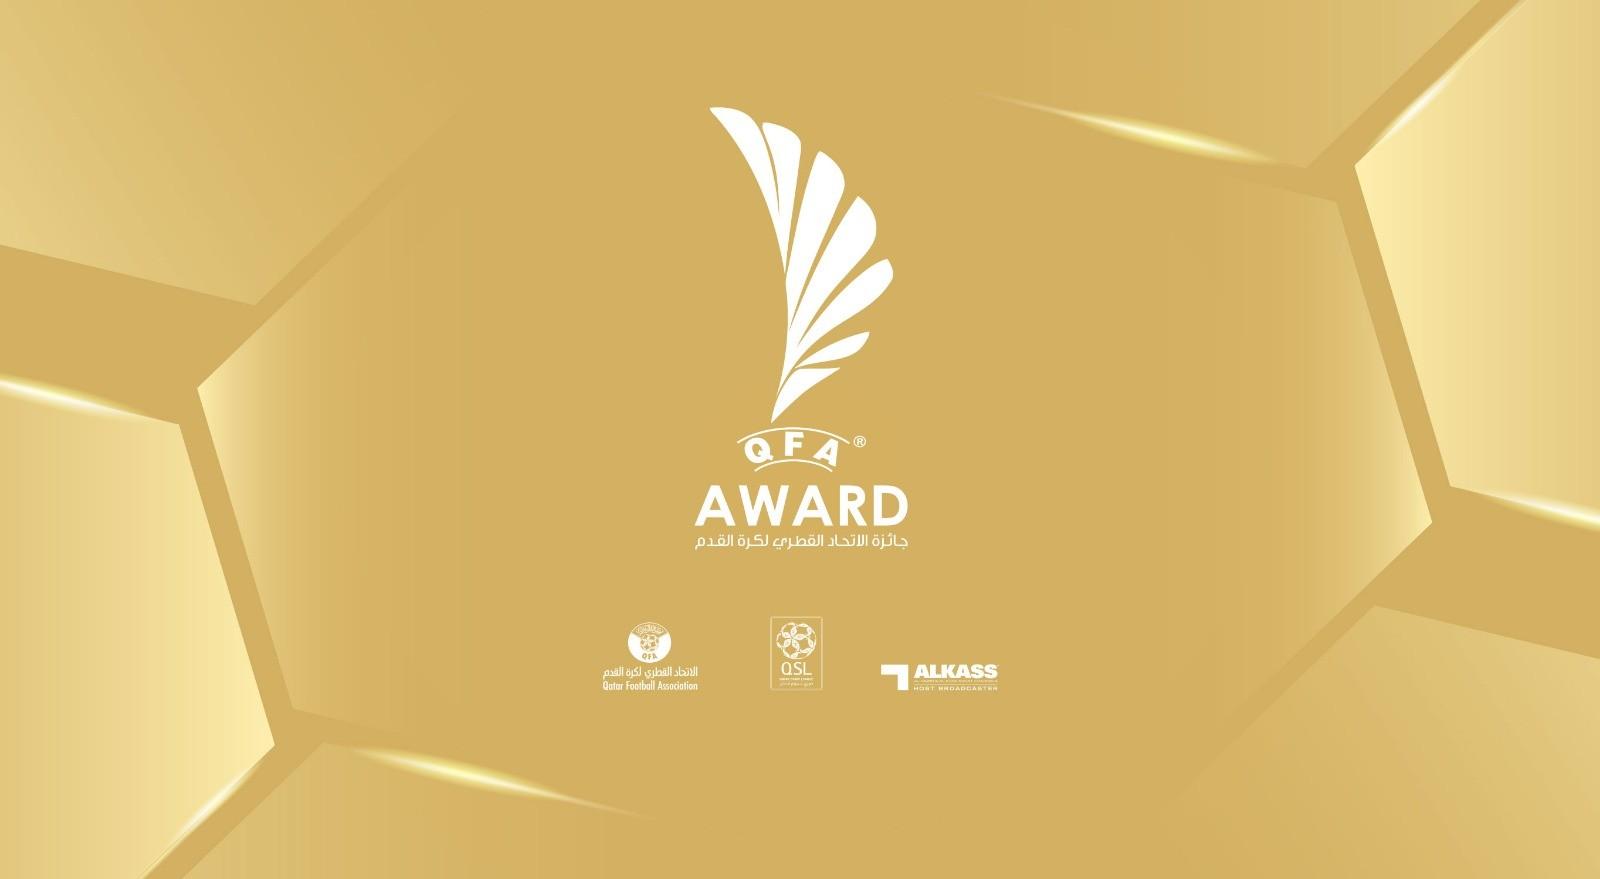 QFA Awards 2018-19 presented